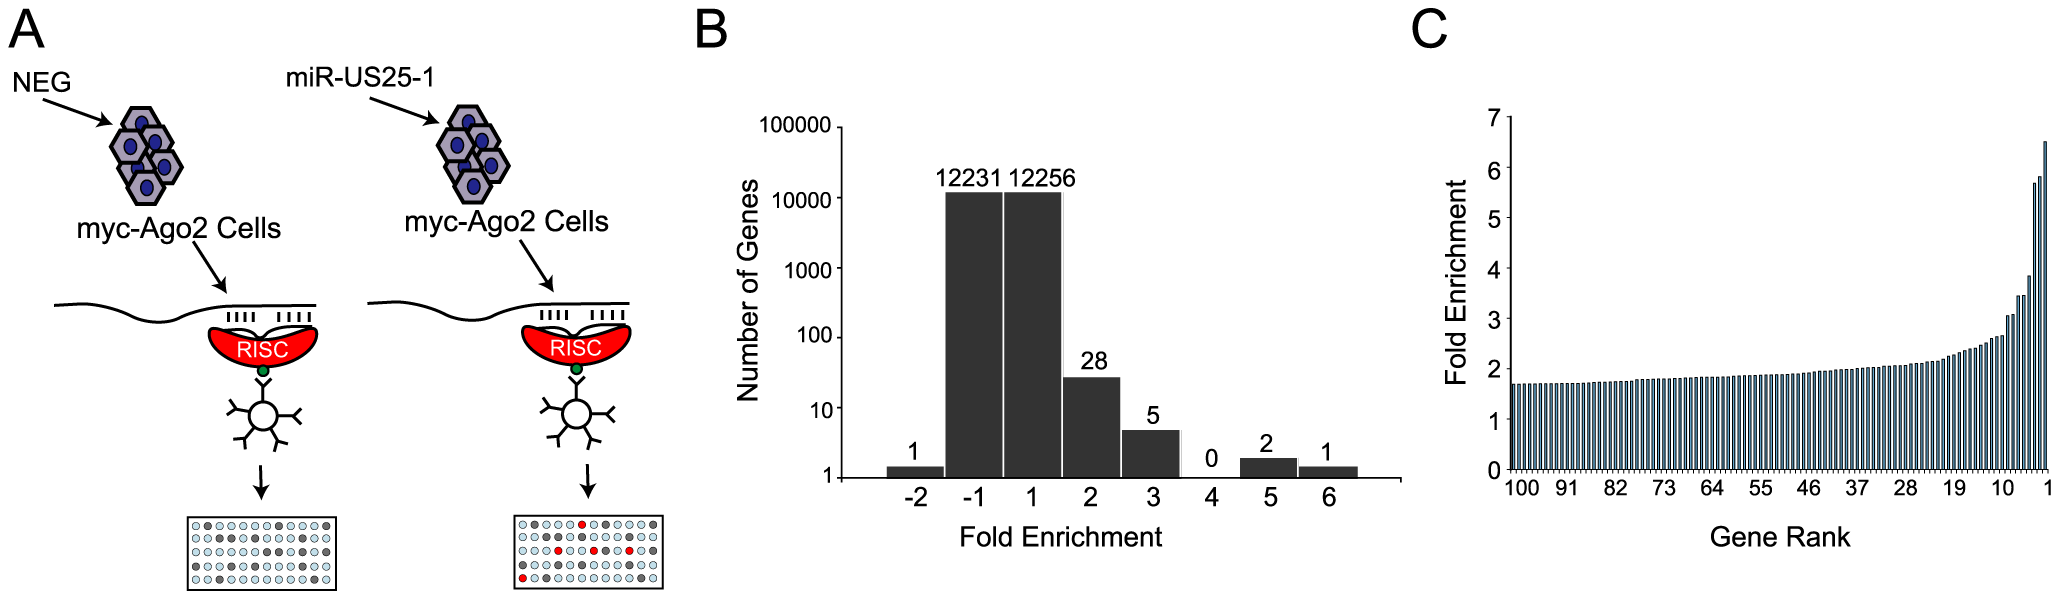 RISC-IP analysis of HCMV encoded miRNA, miR-US25-1.